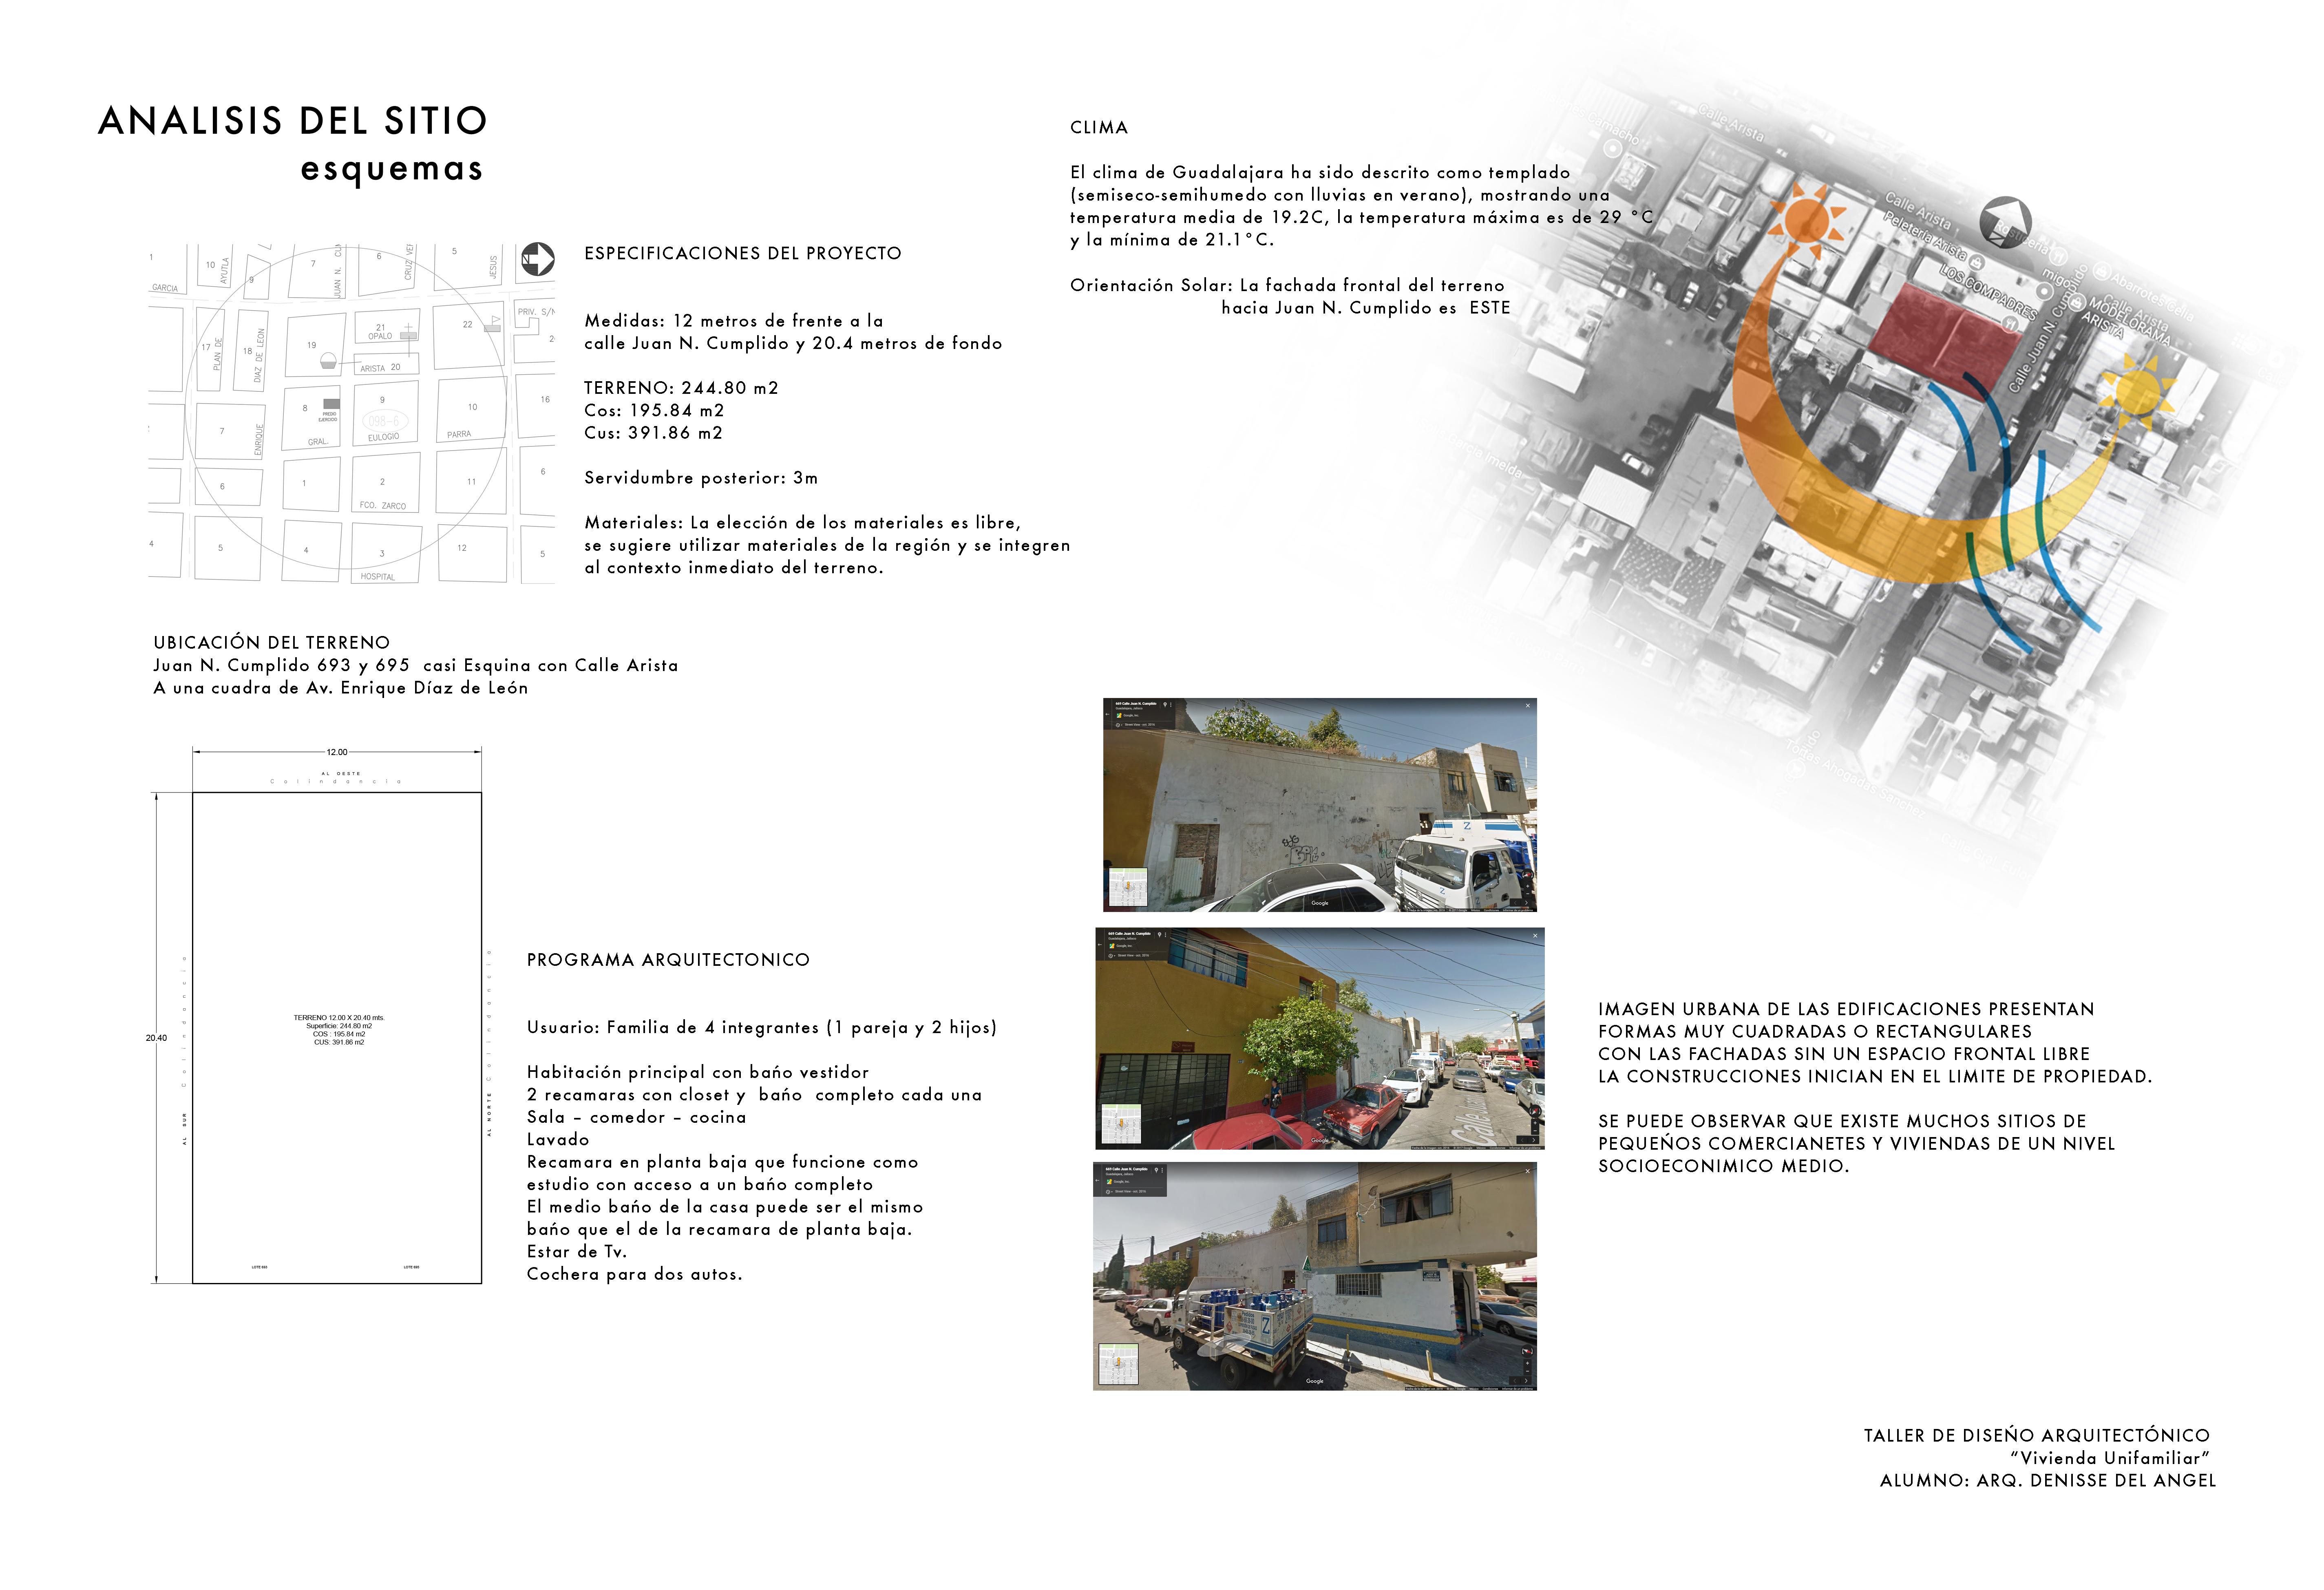 Analisis del sitio taller denisse